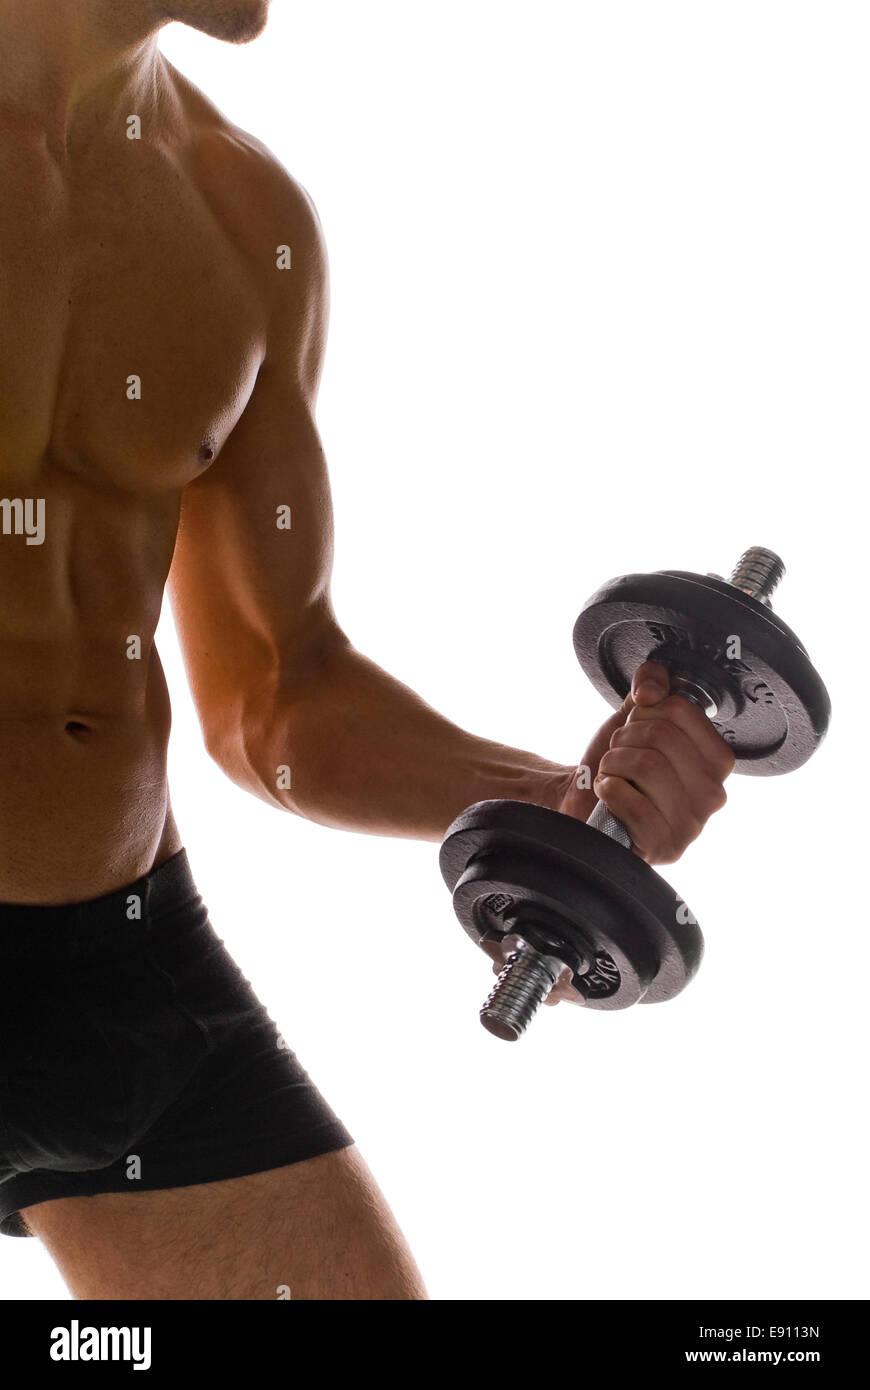 Bodybuilding Immagini Stock